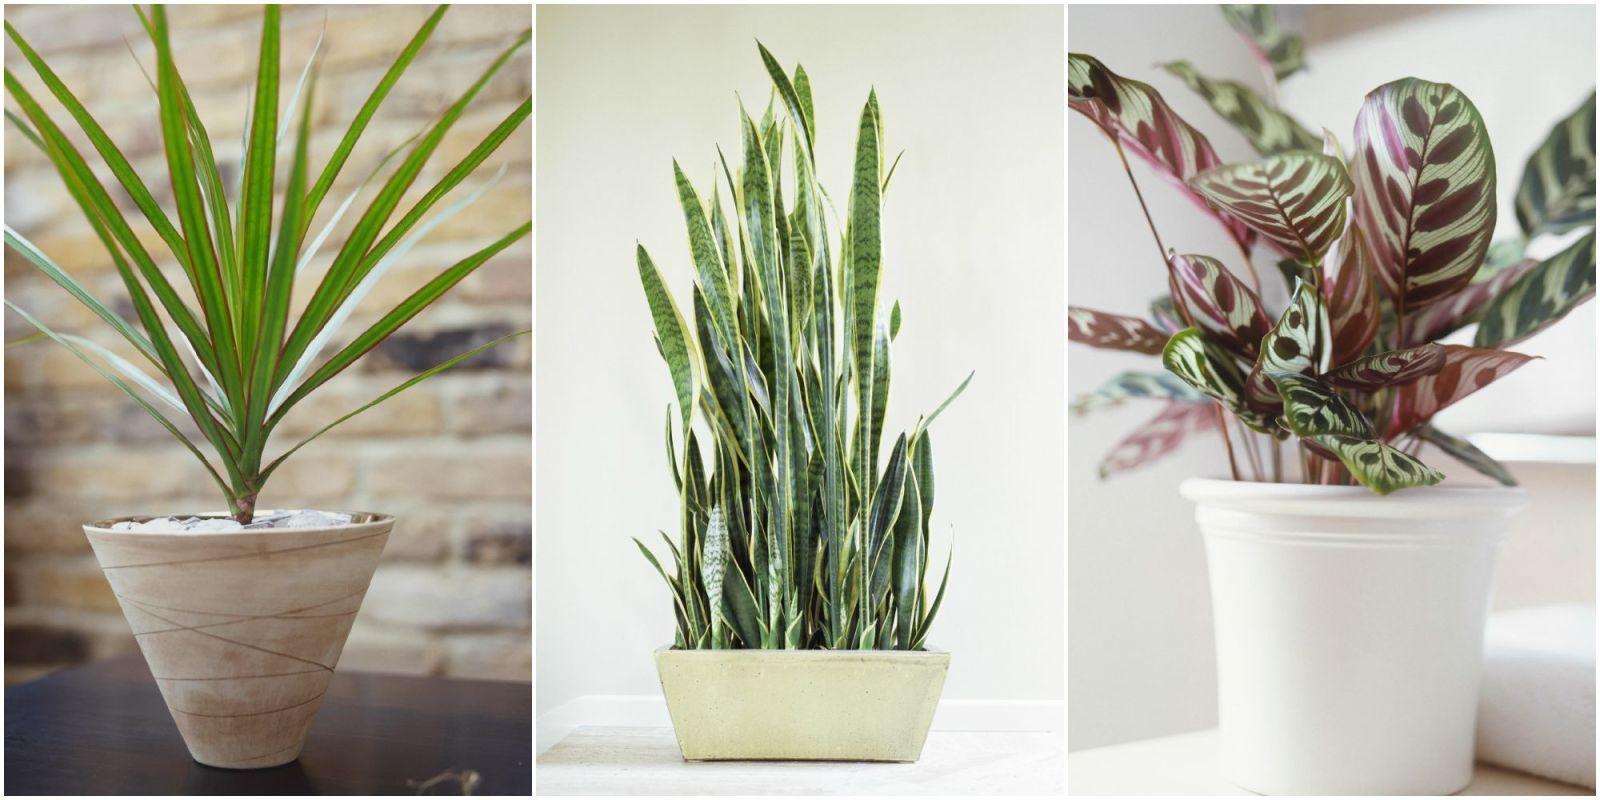 & Low Light Houseplants - Plants That Donu0027t Require Much Light azcodes.com